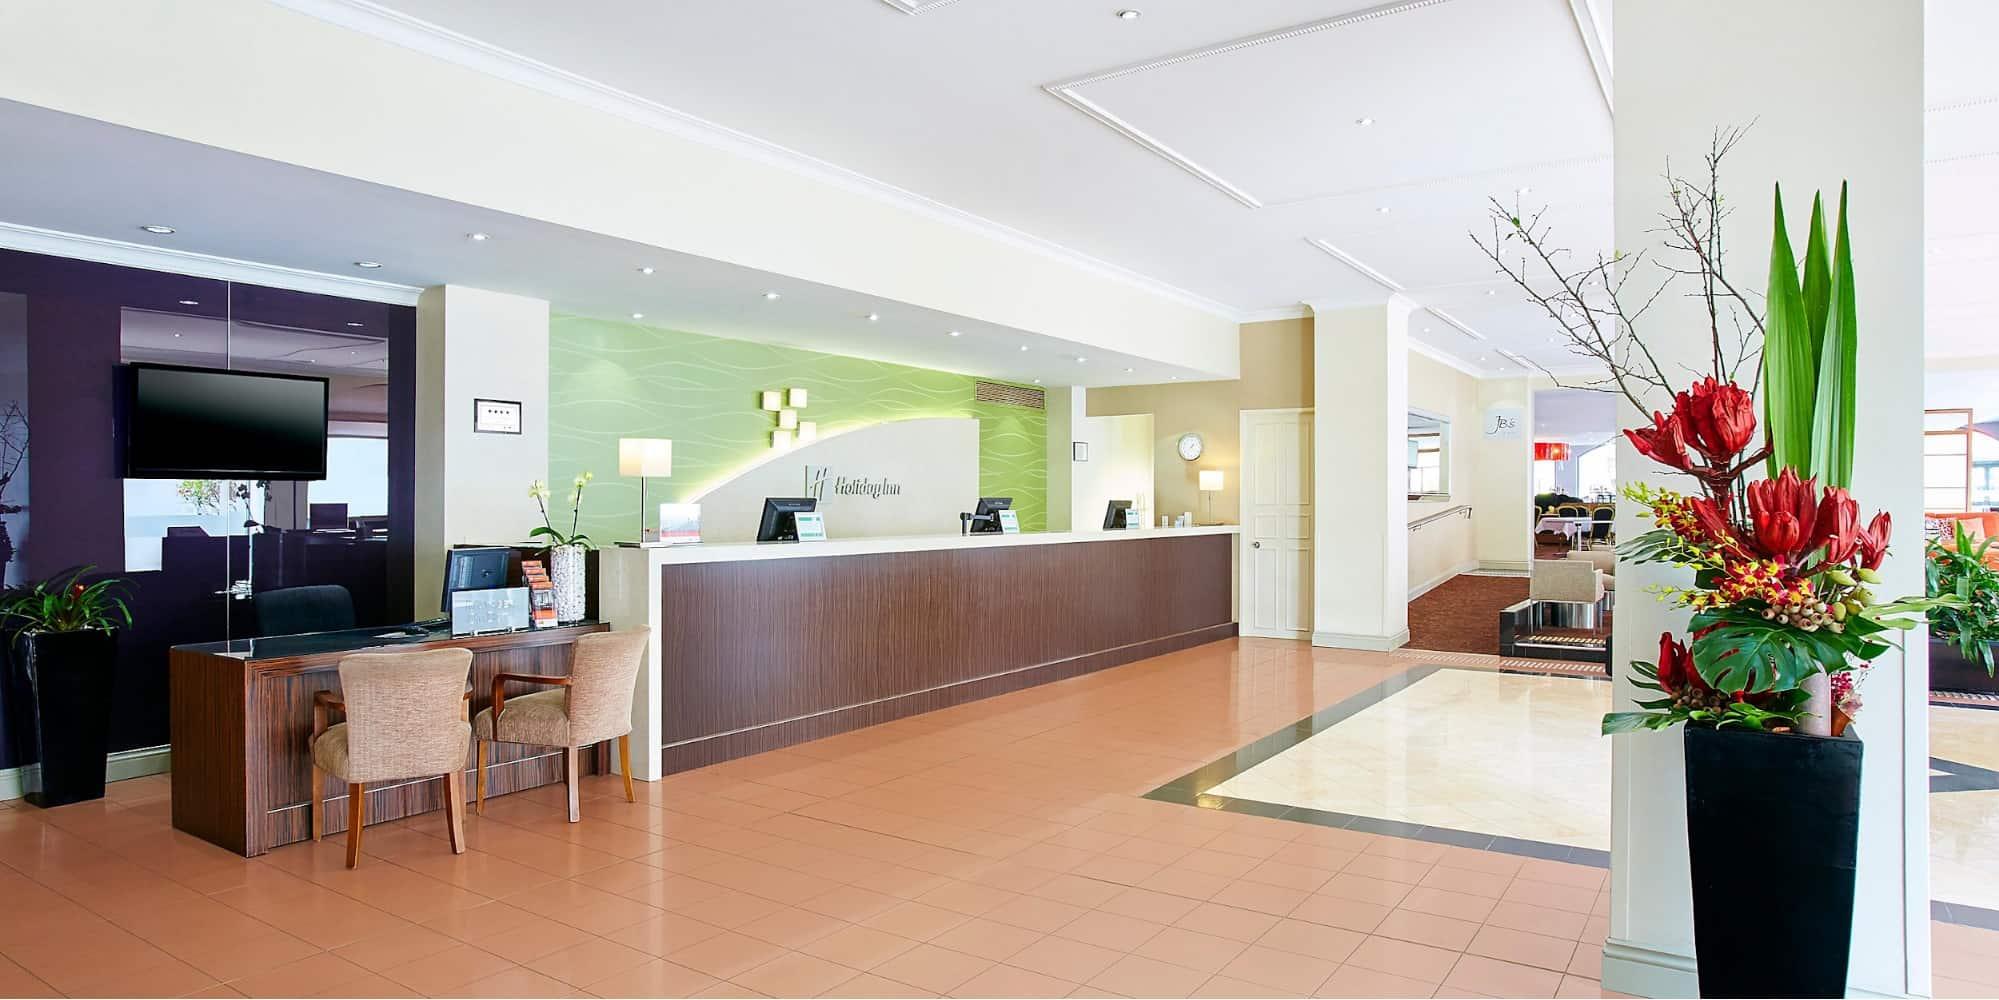 Best Hotels in Sydney - Holiday Inn Darling Harbour